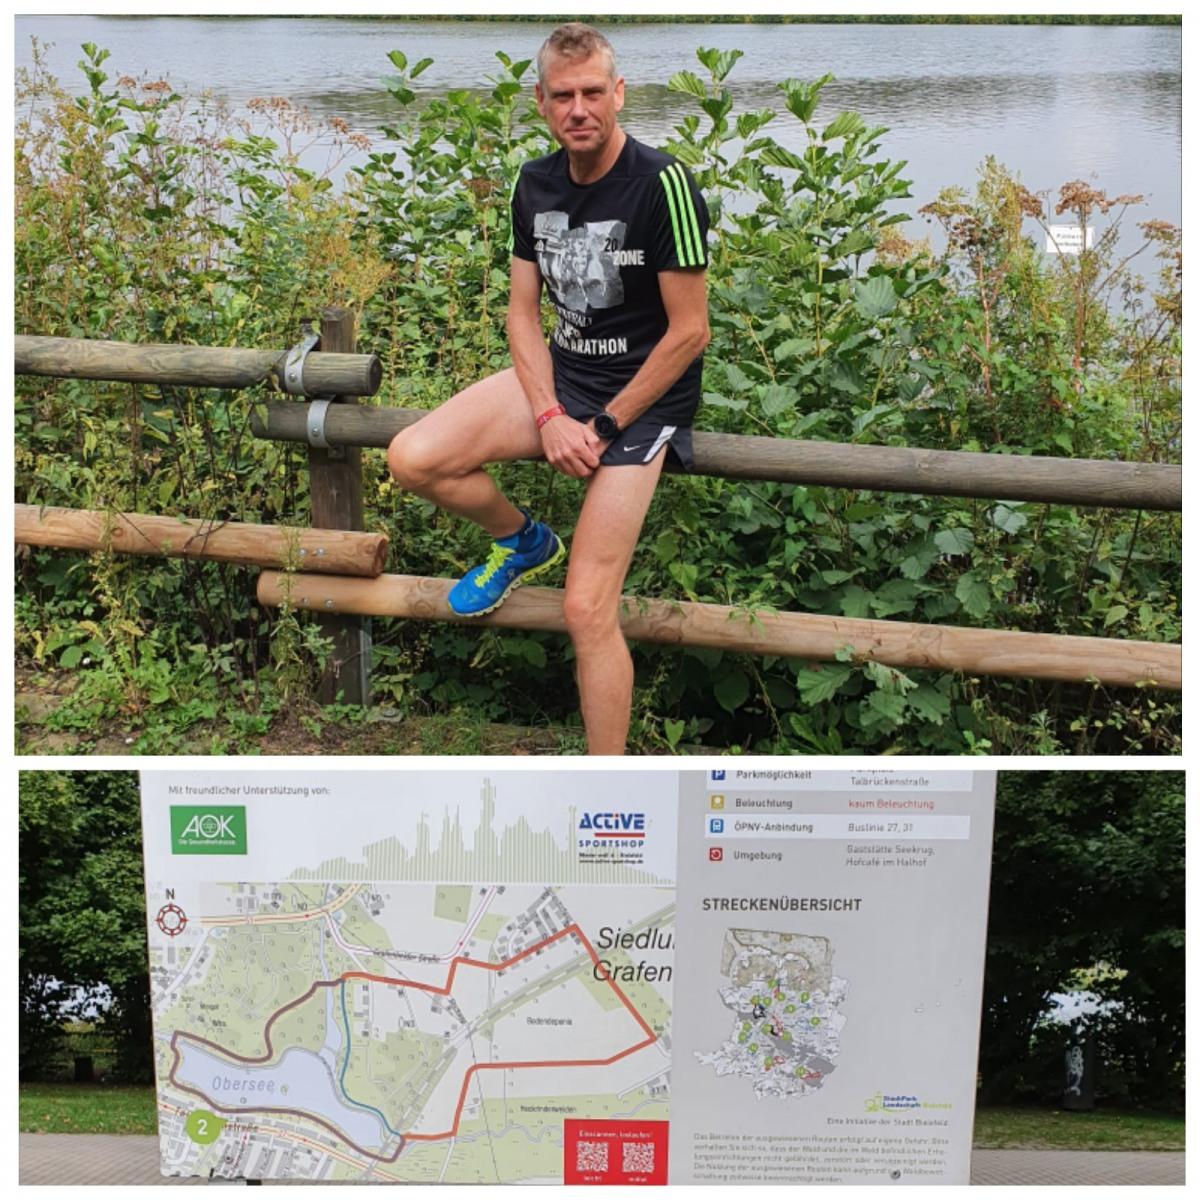 Beimdiek-Klaus-Peter-33-Challenge-Obersee-rF7eU